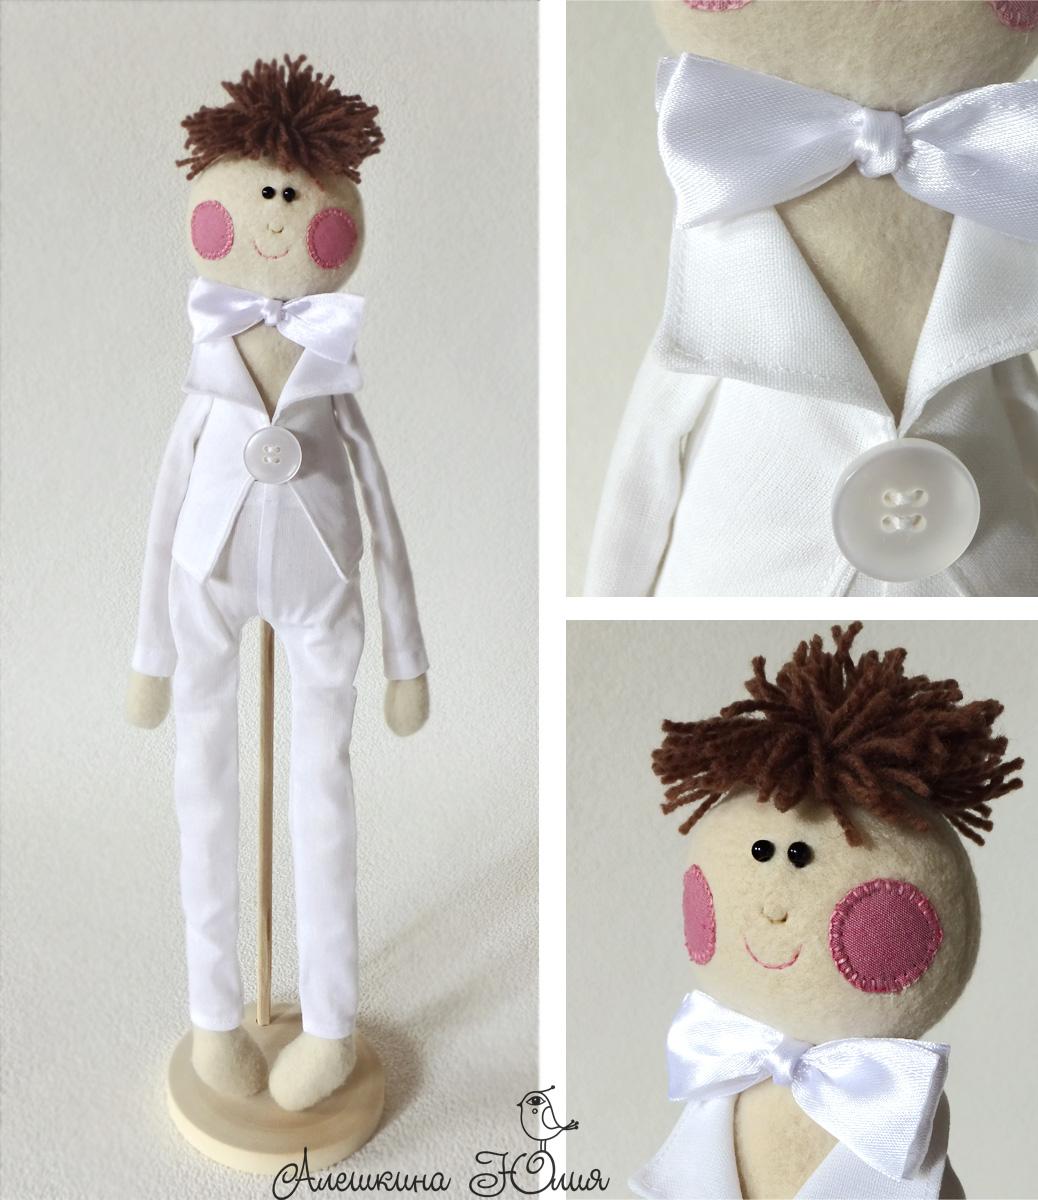 Старинная кукла для подарка молодоженам фото